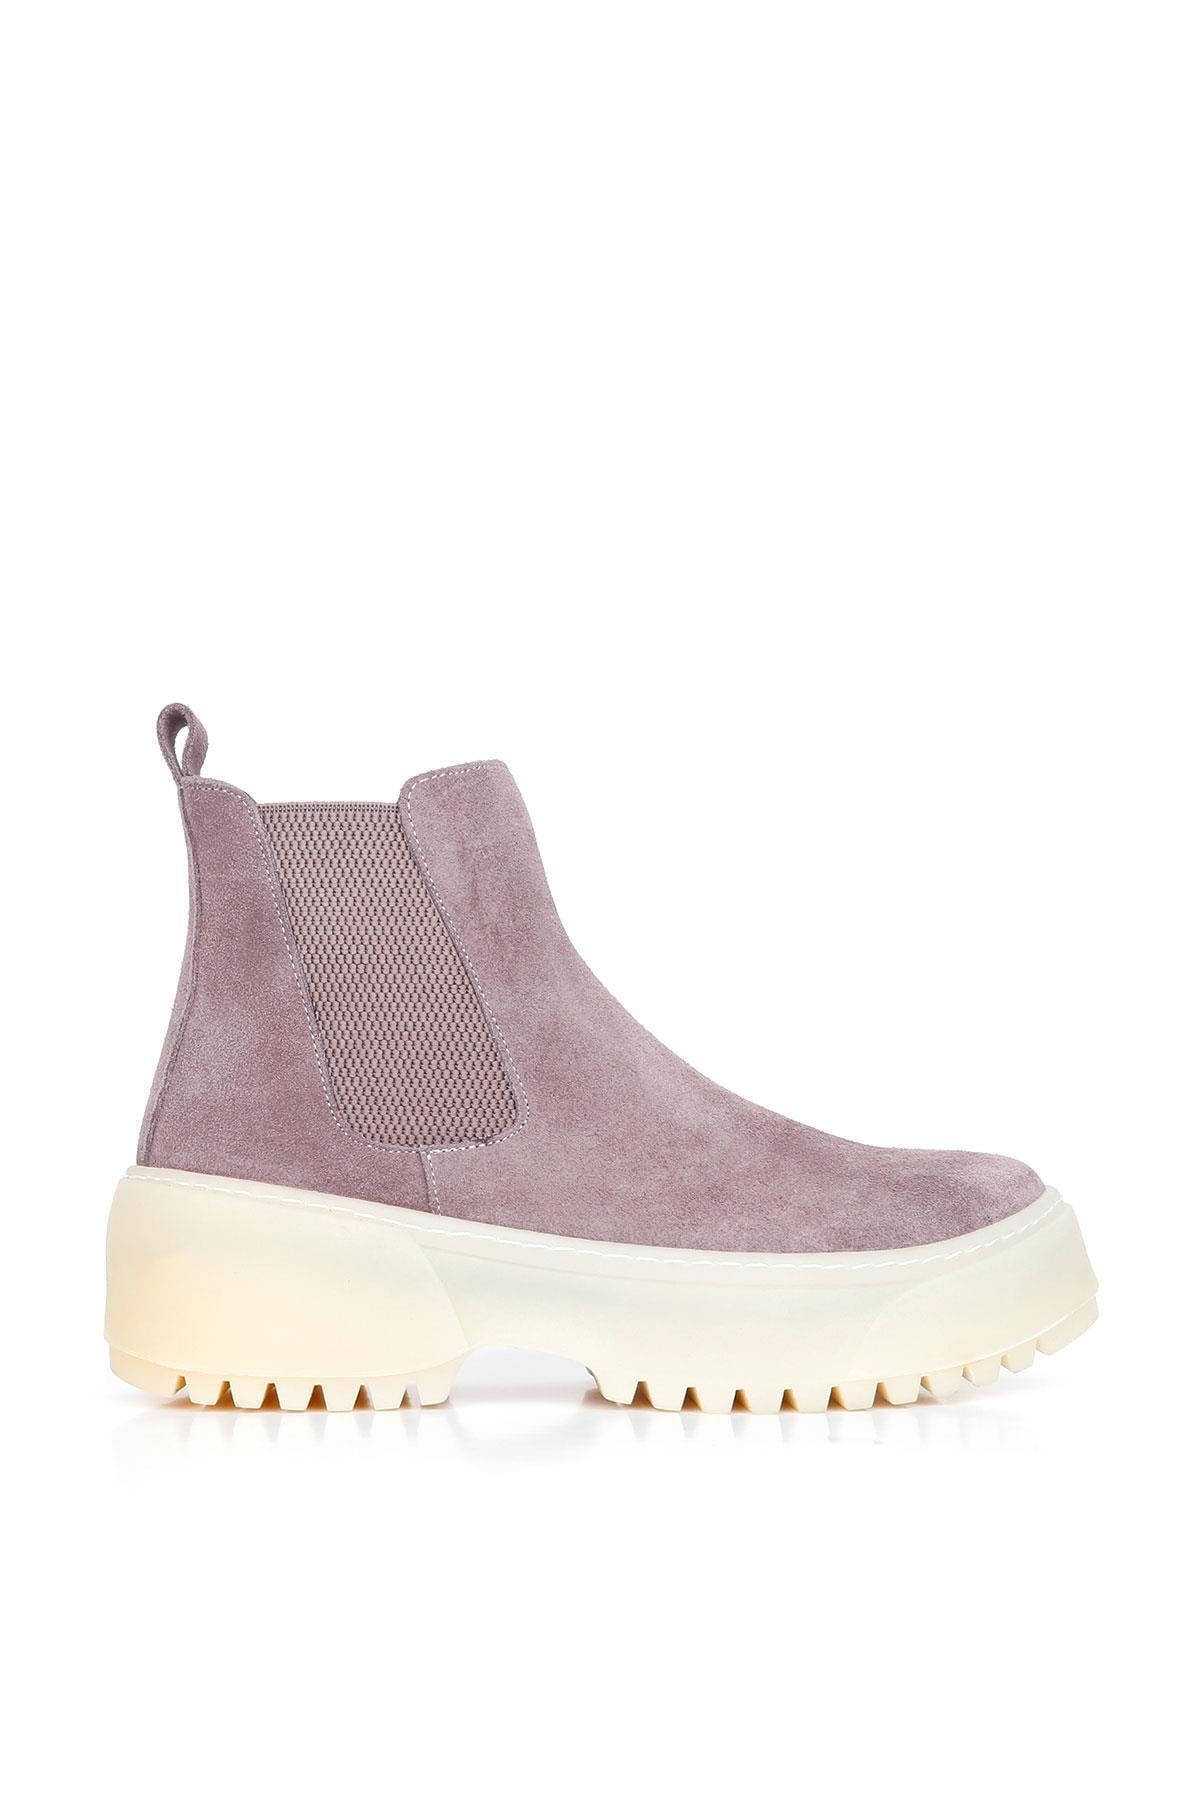 BUENO Shoes Hakiki Deri Kadın Dolgu Topuk Bot 01wr4701 1